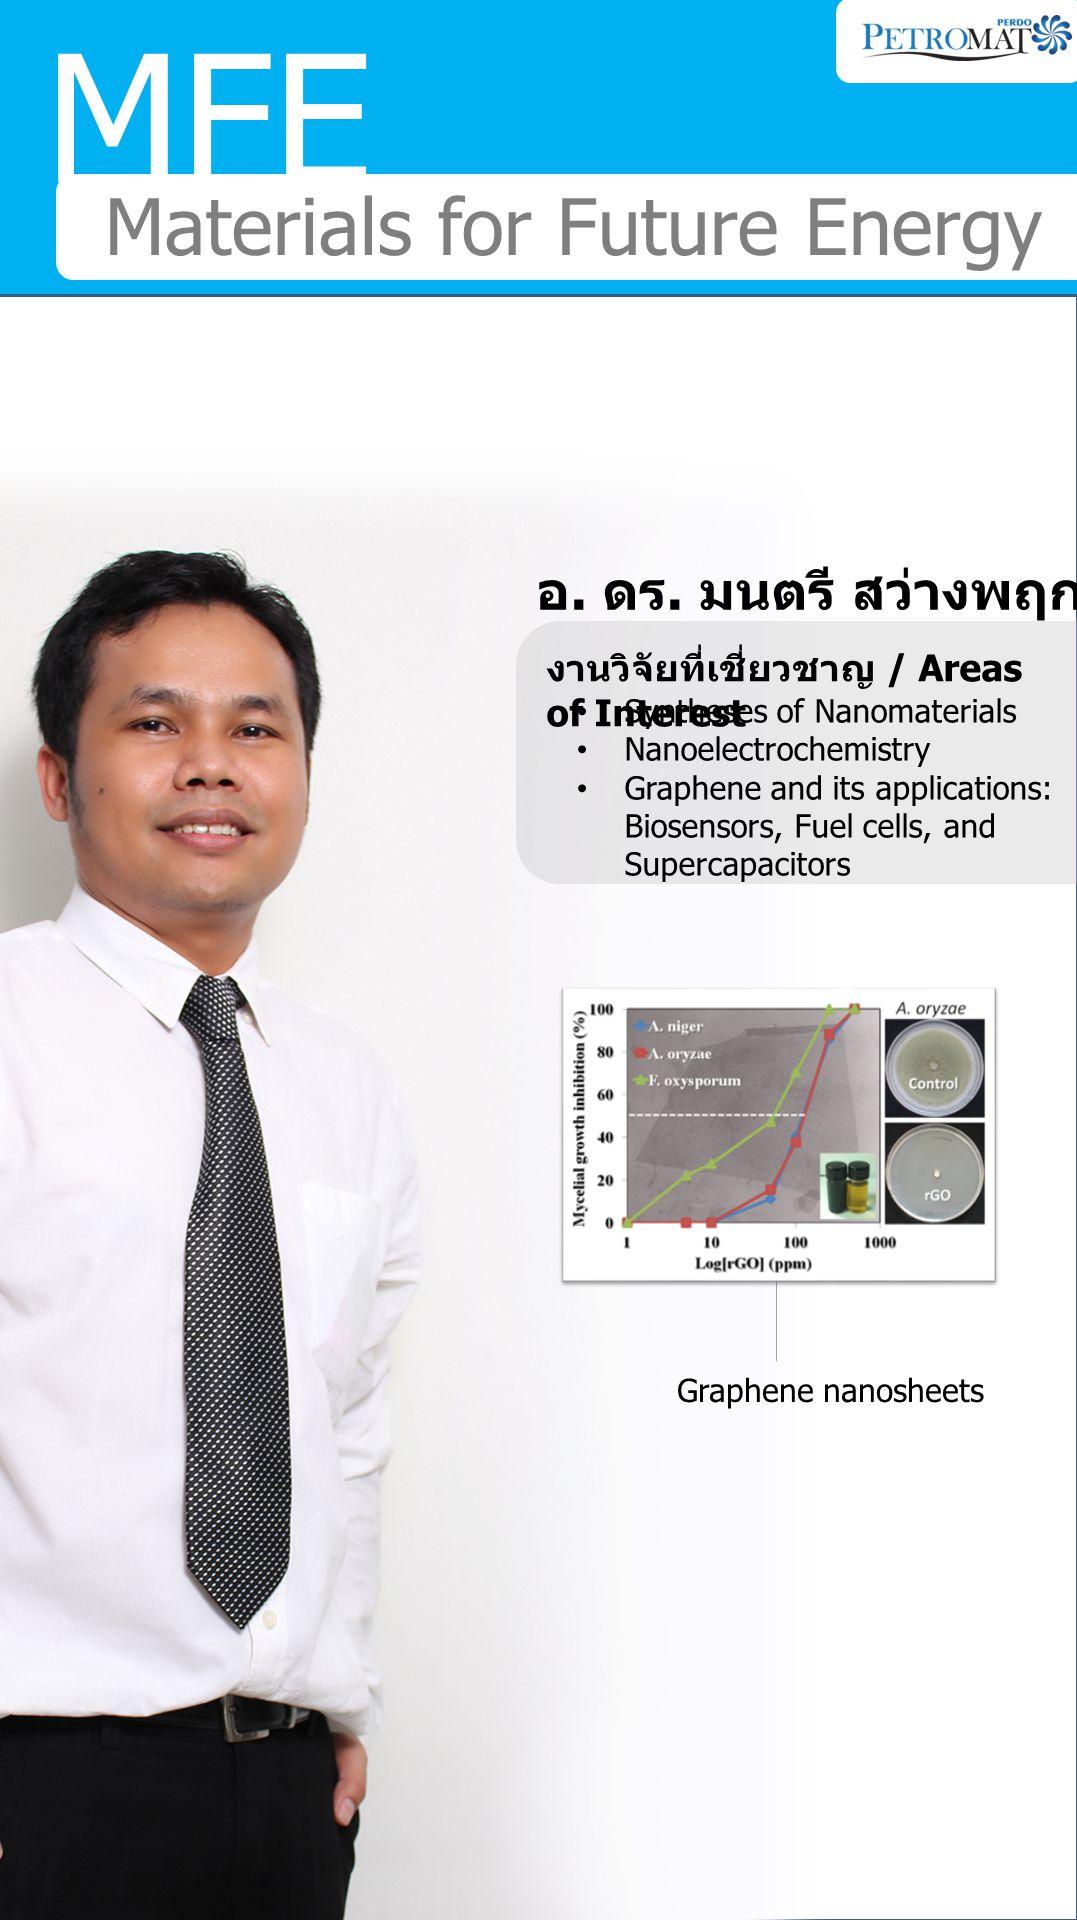 MFE Materials for Future Energy ศ. ดร. ธราพงษ์ วิทิตศานต์ งานวิจัยที่เชี่ยวชาญ / Areas of Interest Biomass to liquid gas and solid fuels FT and methan